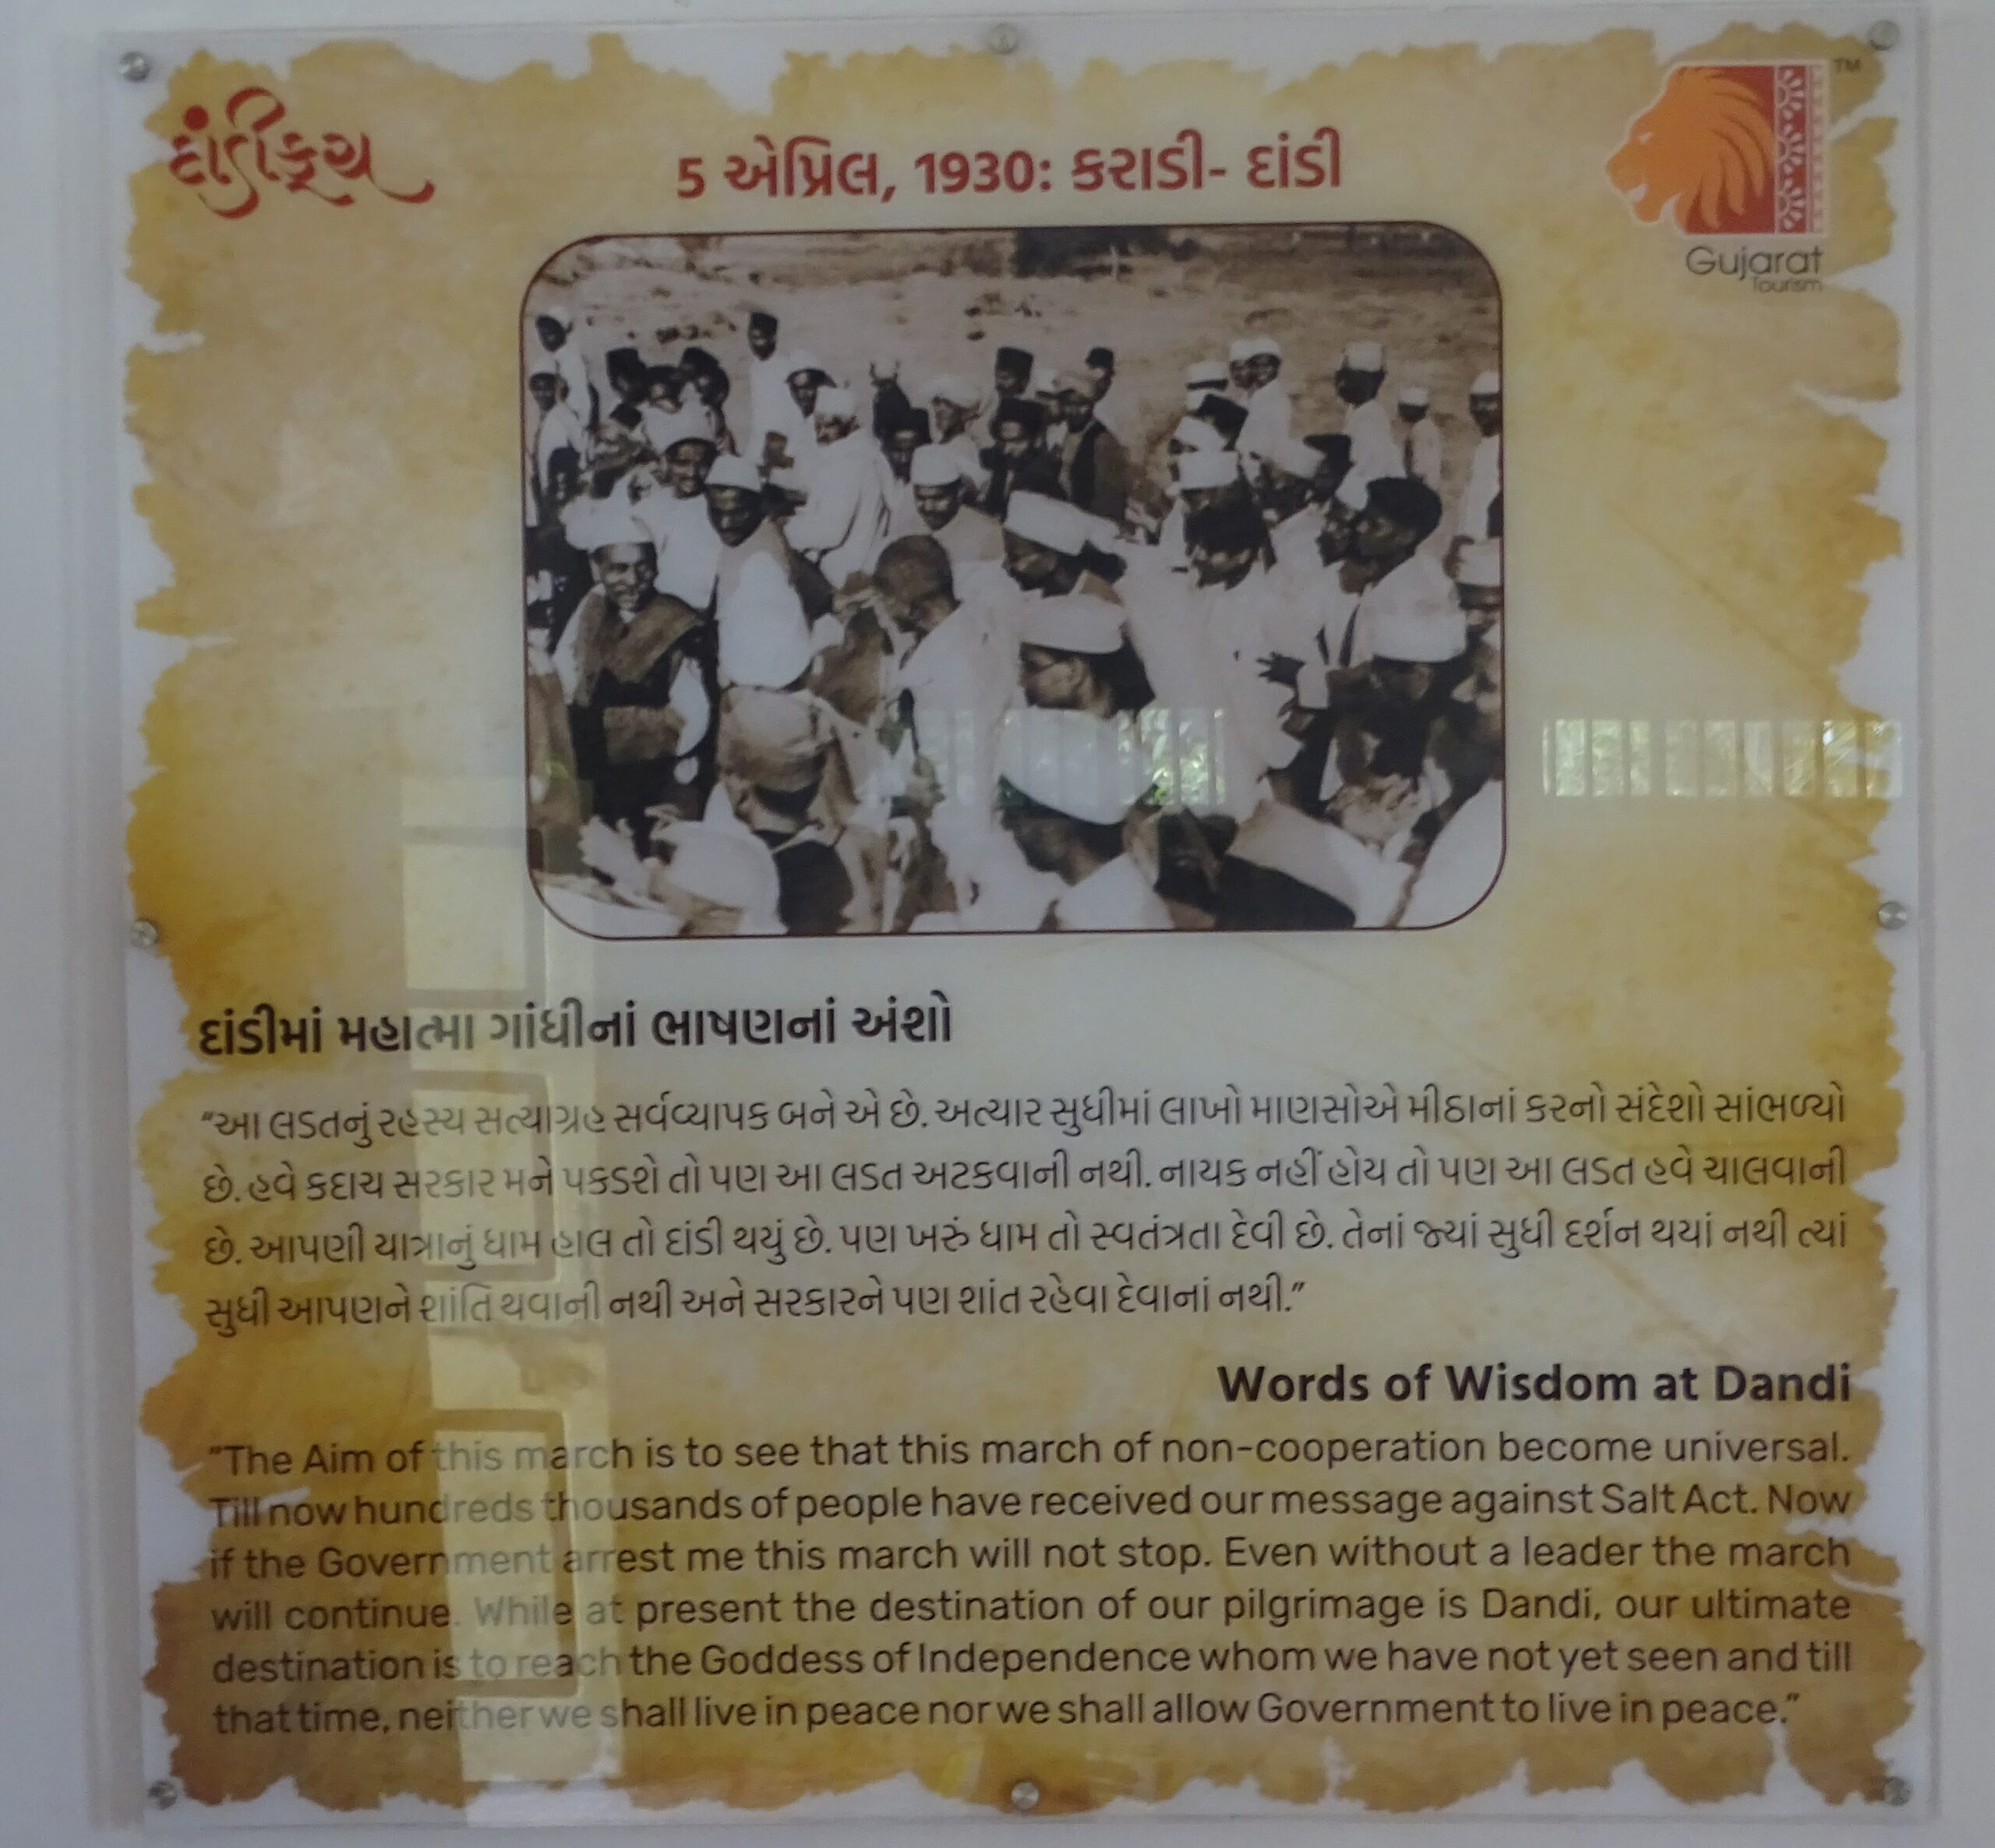 5 April, 1930 - Words of Wisdom by M. K. Gandhi at Dandi, Gujarat